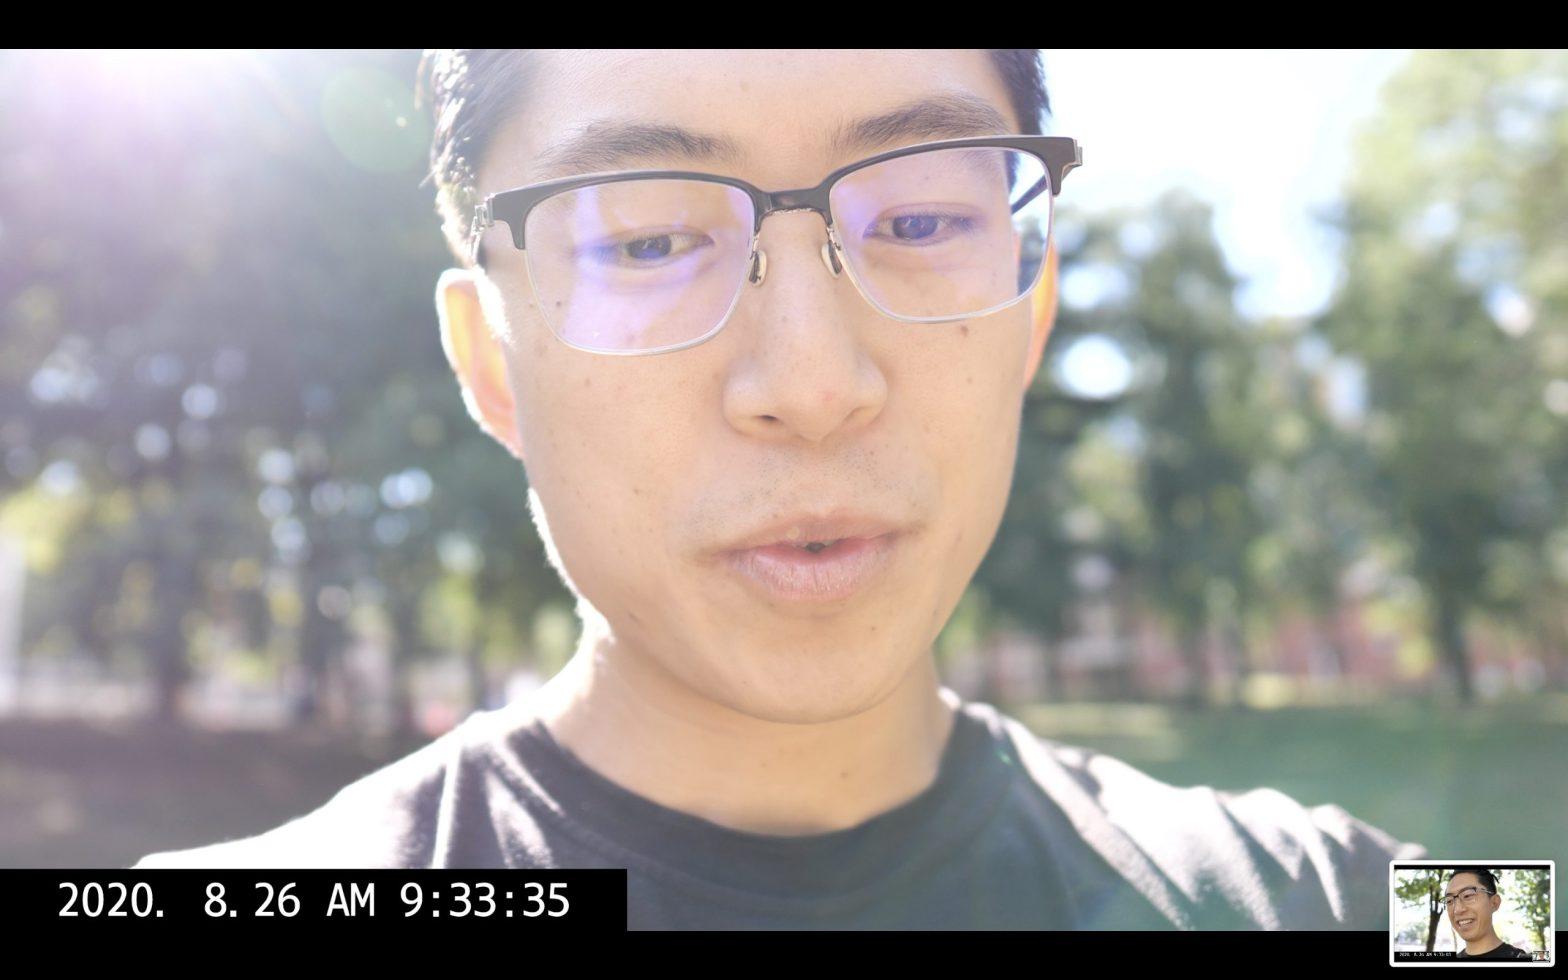 talking selfie ERIC KIM